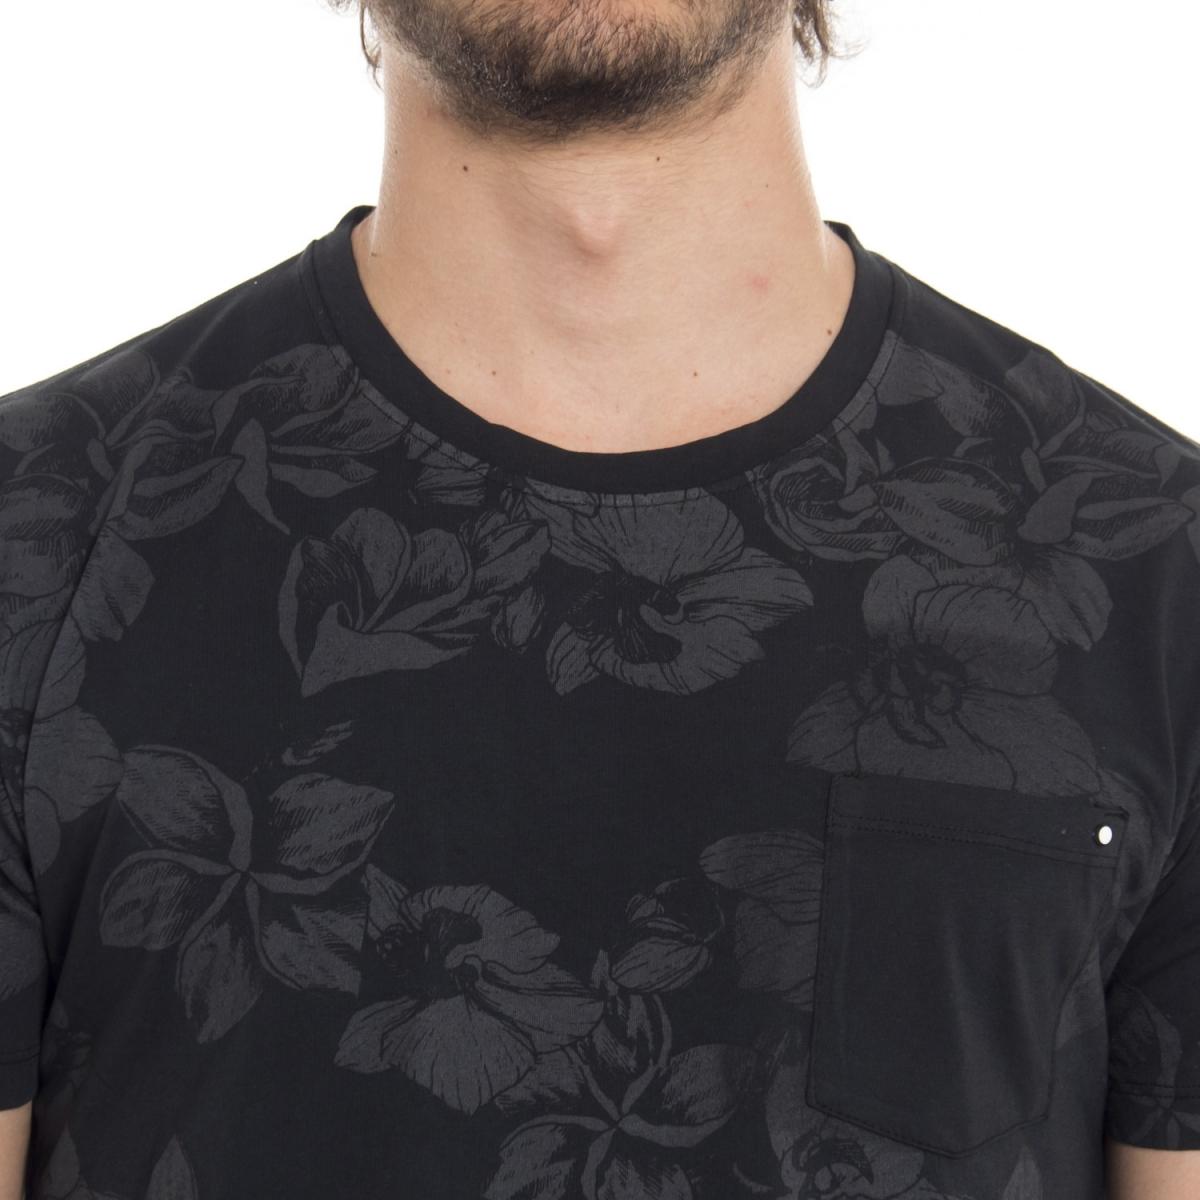 clothing T-shirt men T-Shirt LP23-233 LANDEK PARK Cafedelmar Shop